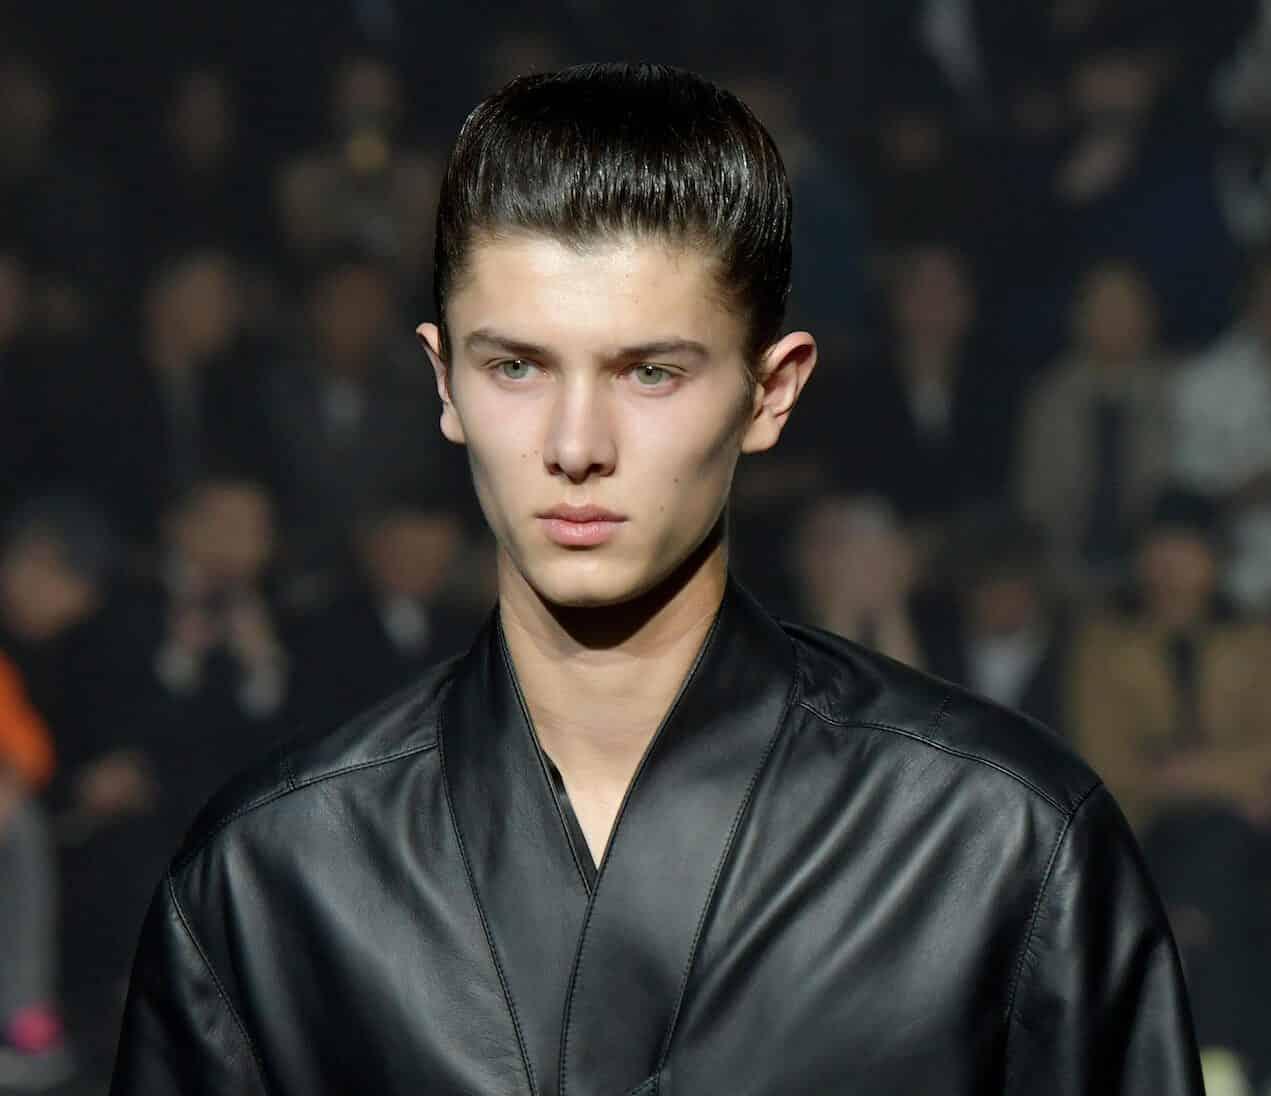 Prinz Nikolai genießt das Modelleben